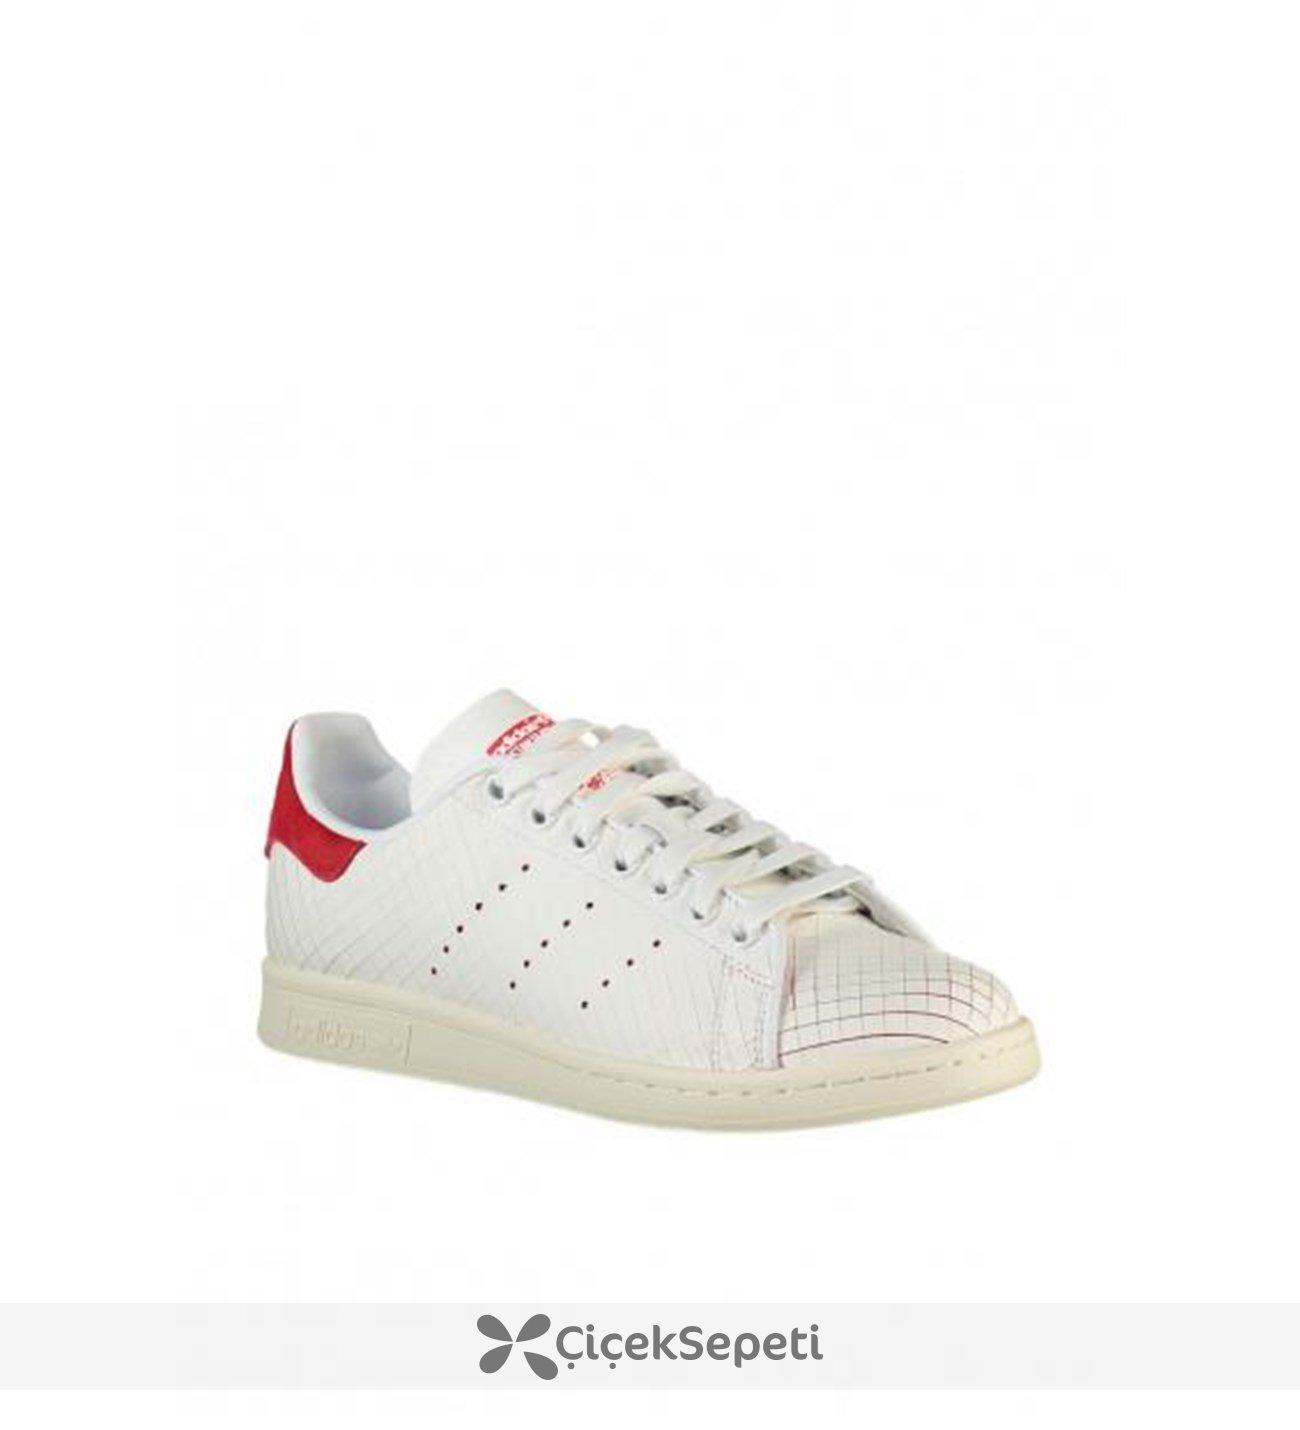 Adidas Stan Smıth W Kadın Spor Ayakkabı S32258